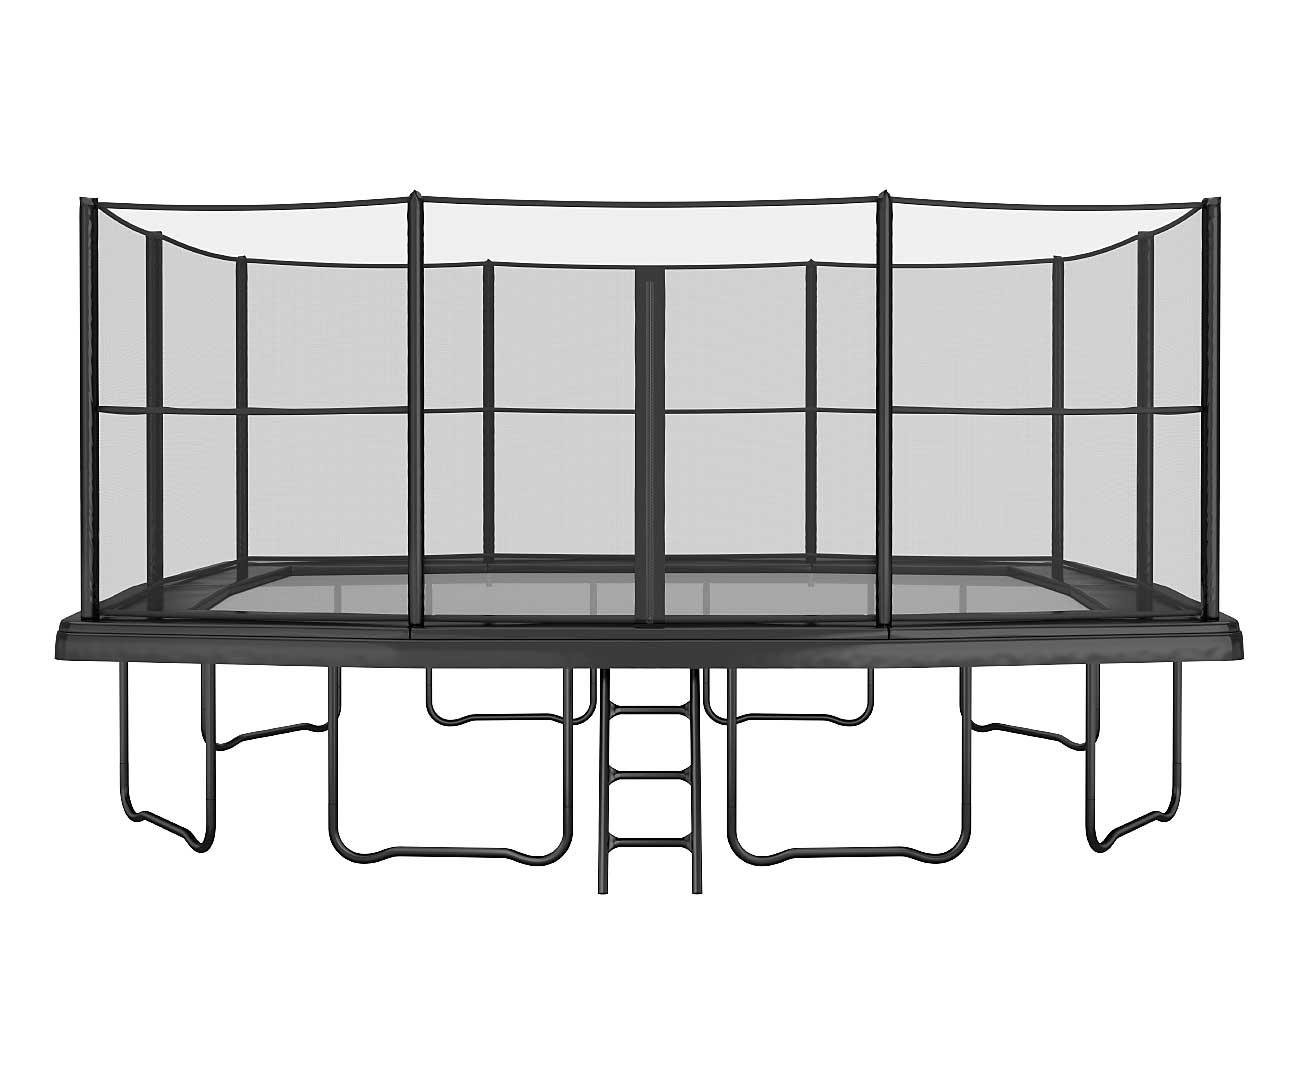 Akrobat trampolin Primu Challenger 17x10 FT